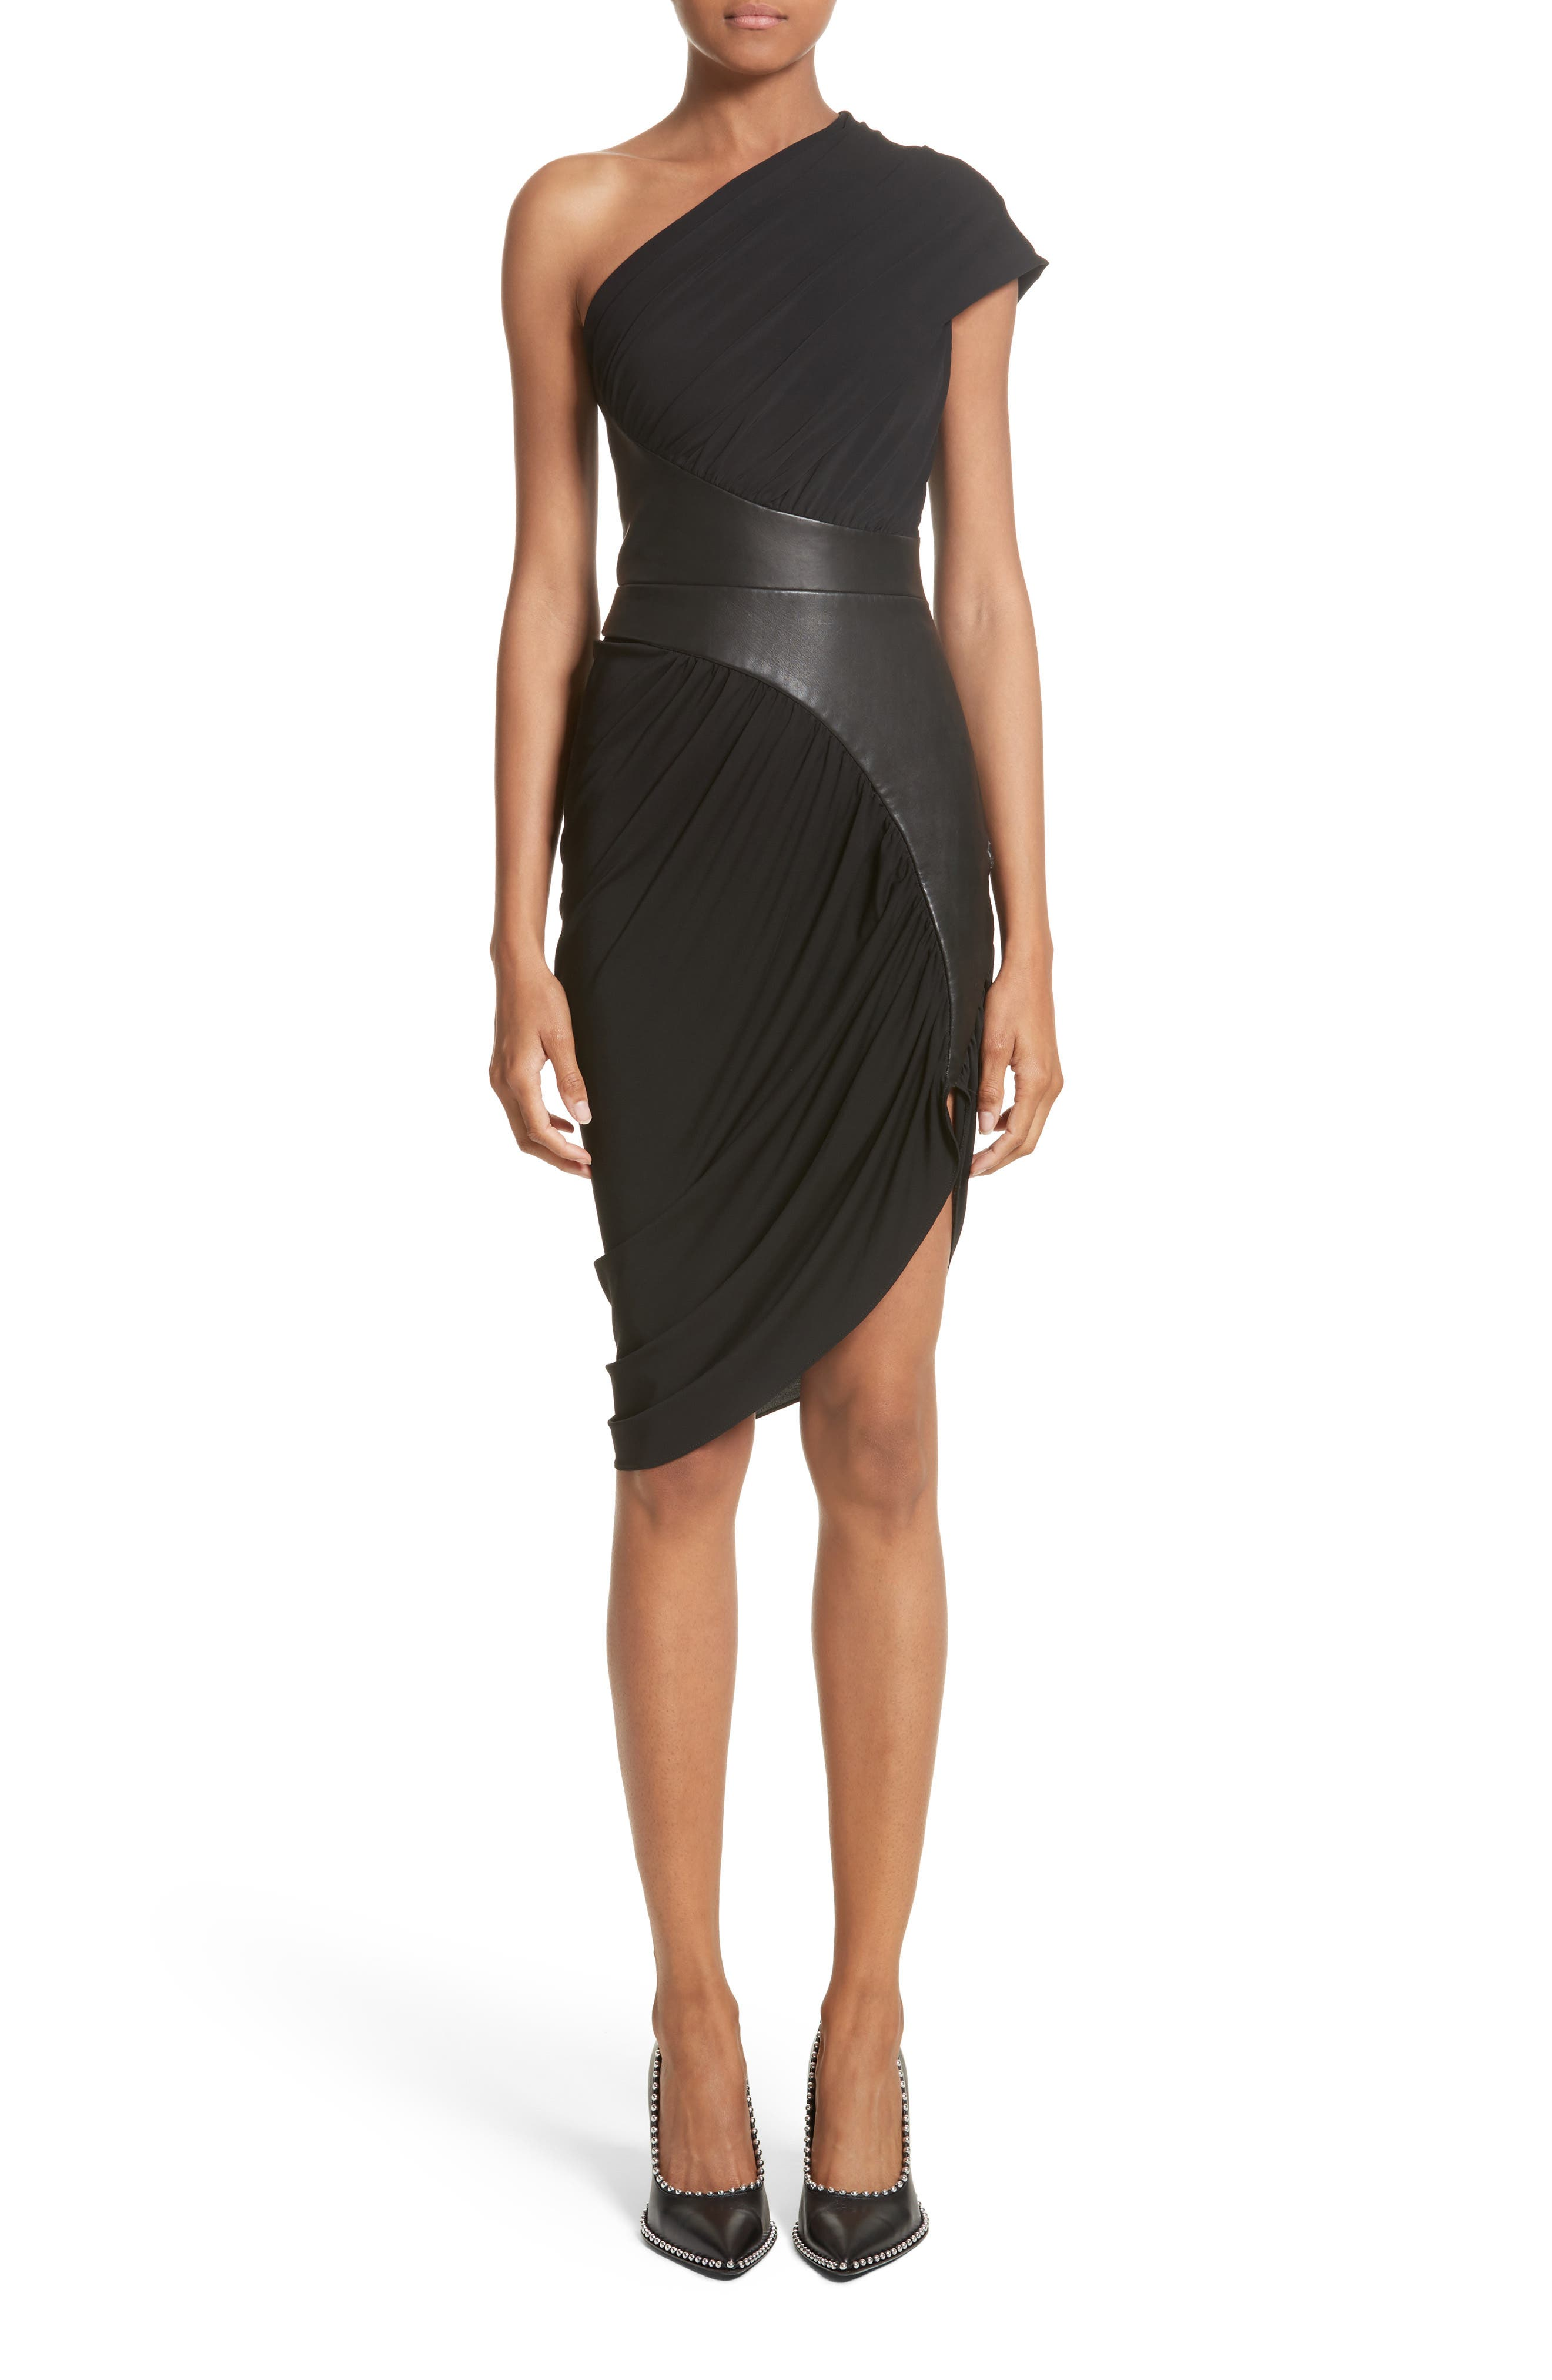 Alternate Image 1 Selected - Alexander Wang Leather Detail Draped One-Shoulder Dress